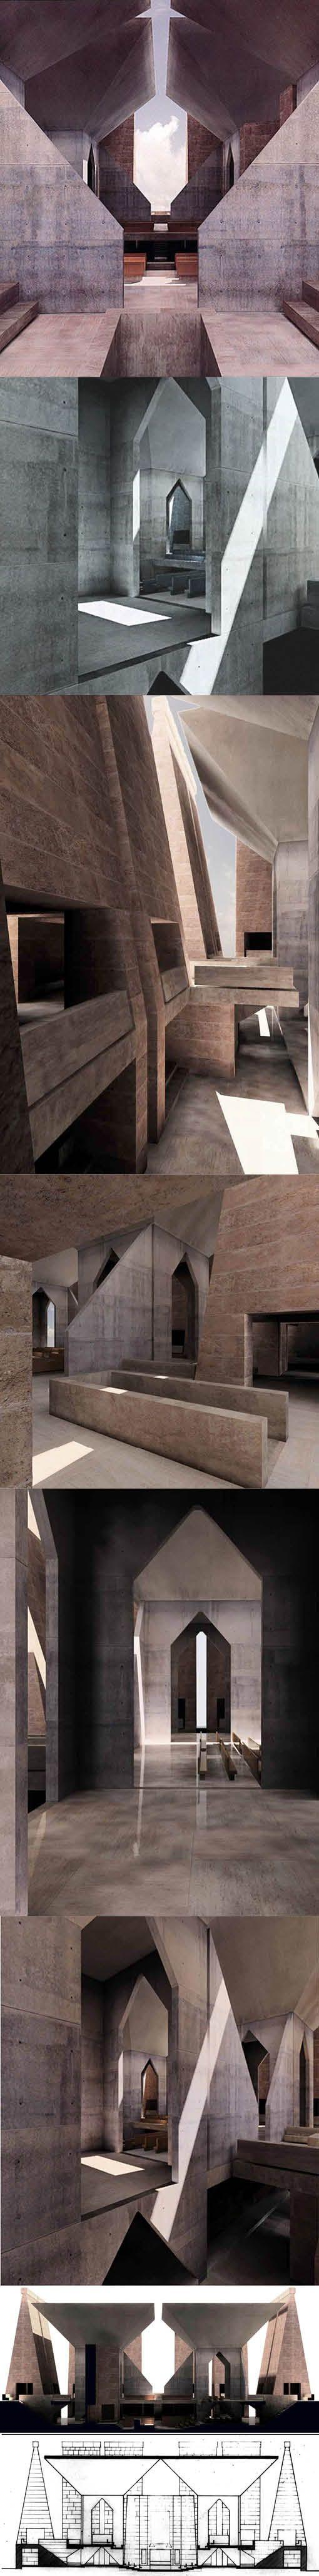 1967-1974 Louis Kahn - Hurva Synagogue / Jerusalem Israel / USA / concrete / concept / renderings: Kent Larson